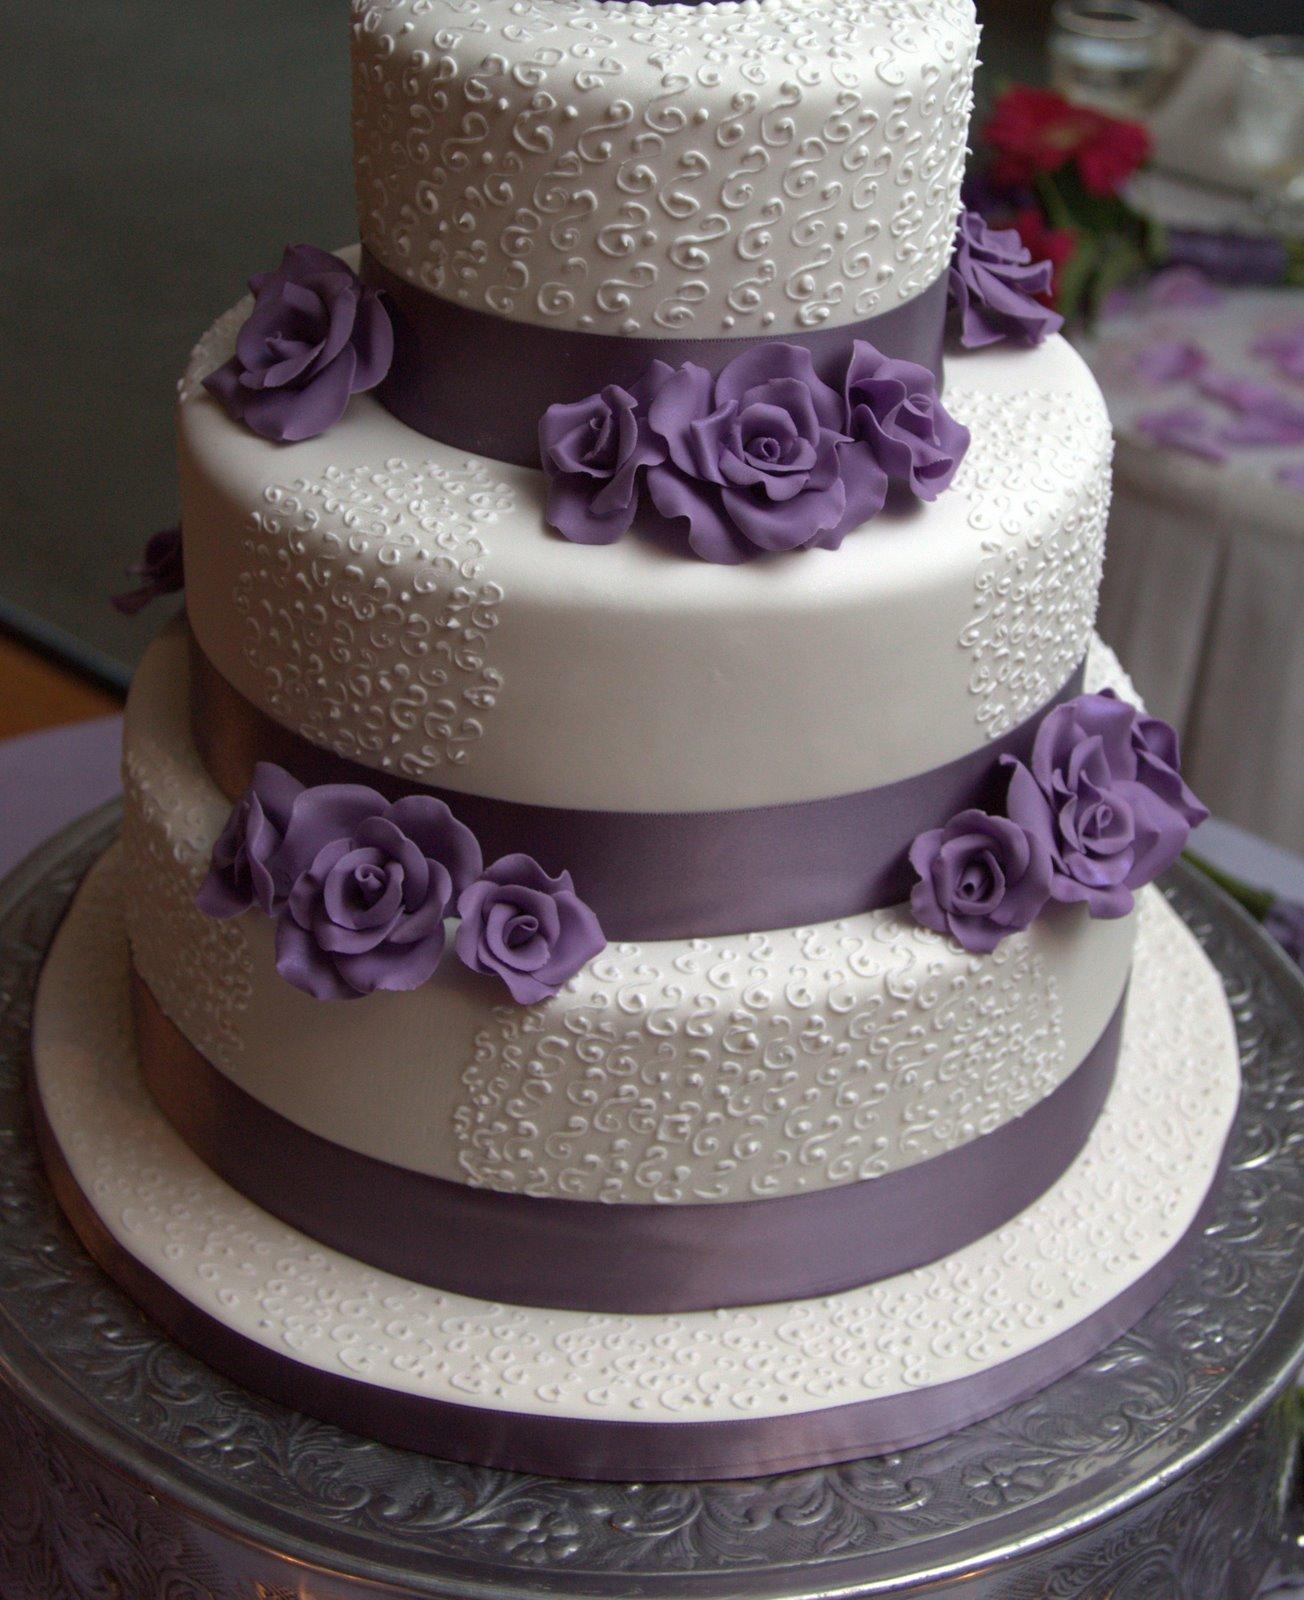 Amazing Grace Cakes Brenda s Wedding Cake & Favors